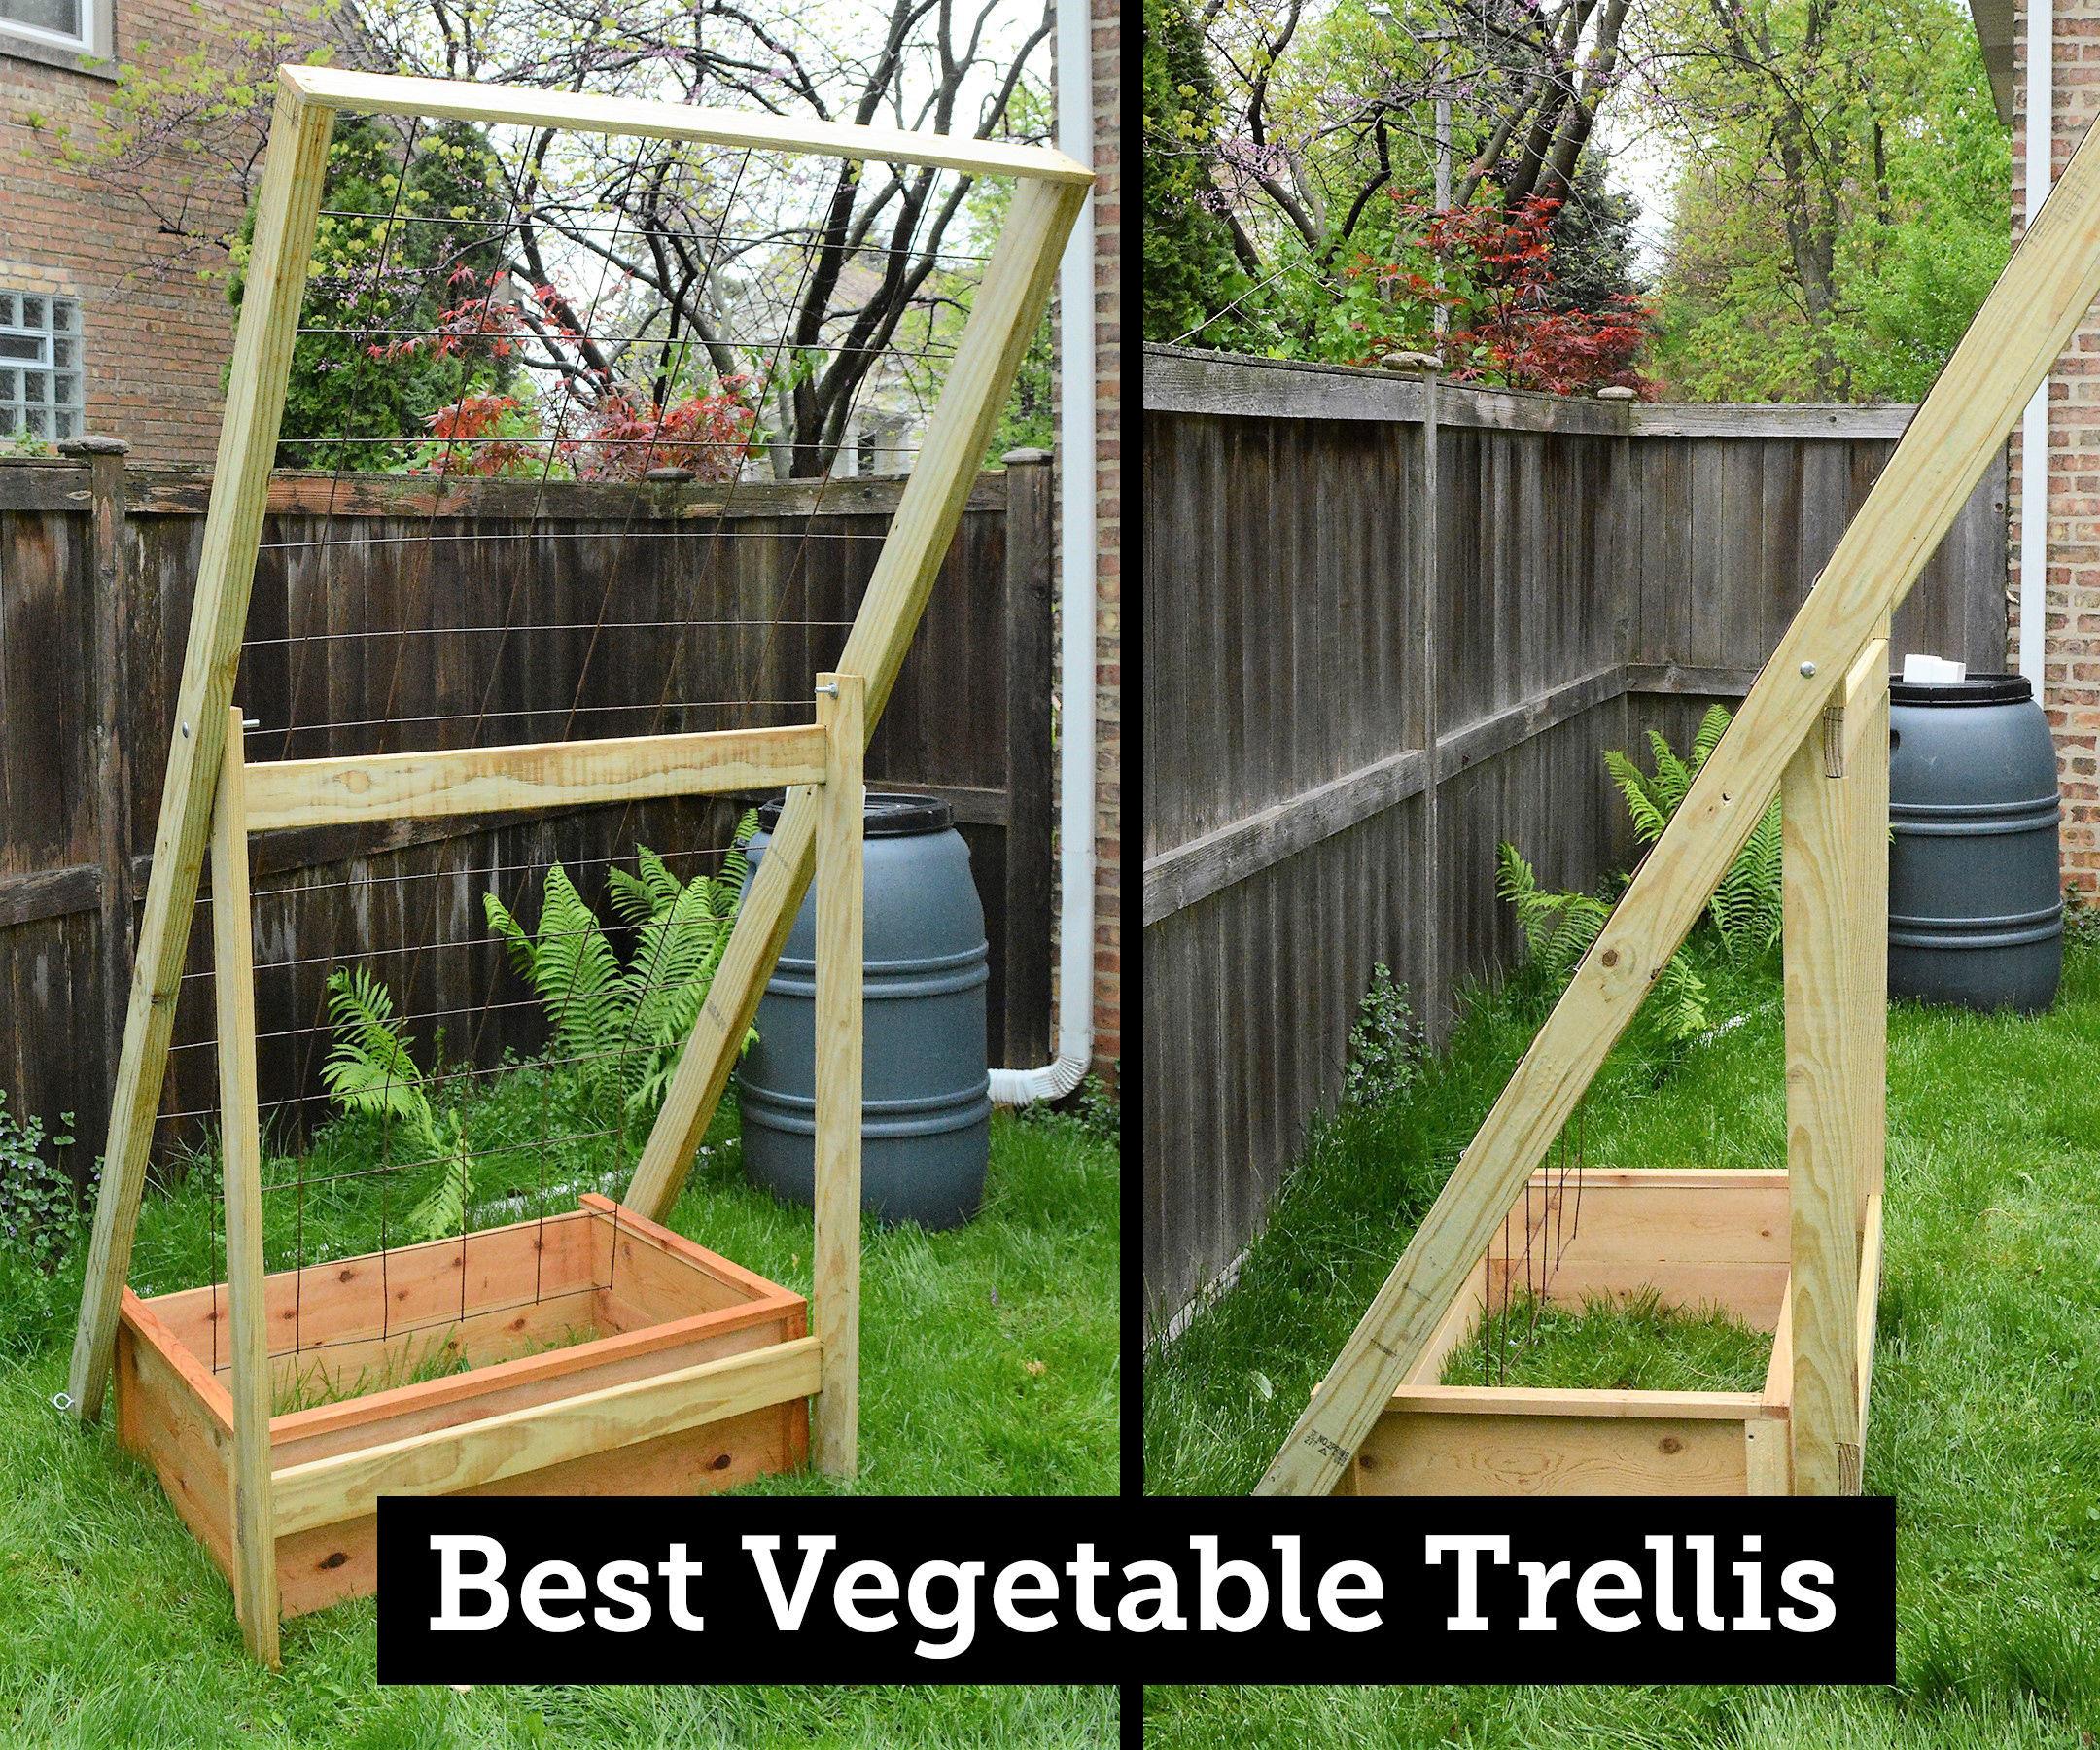 The Best Vegetable Trellis: Durable, Collapsible, Flexible